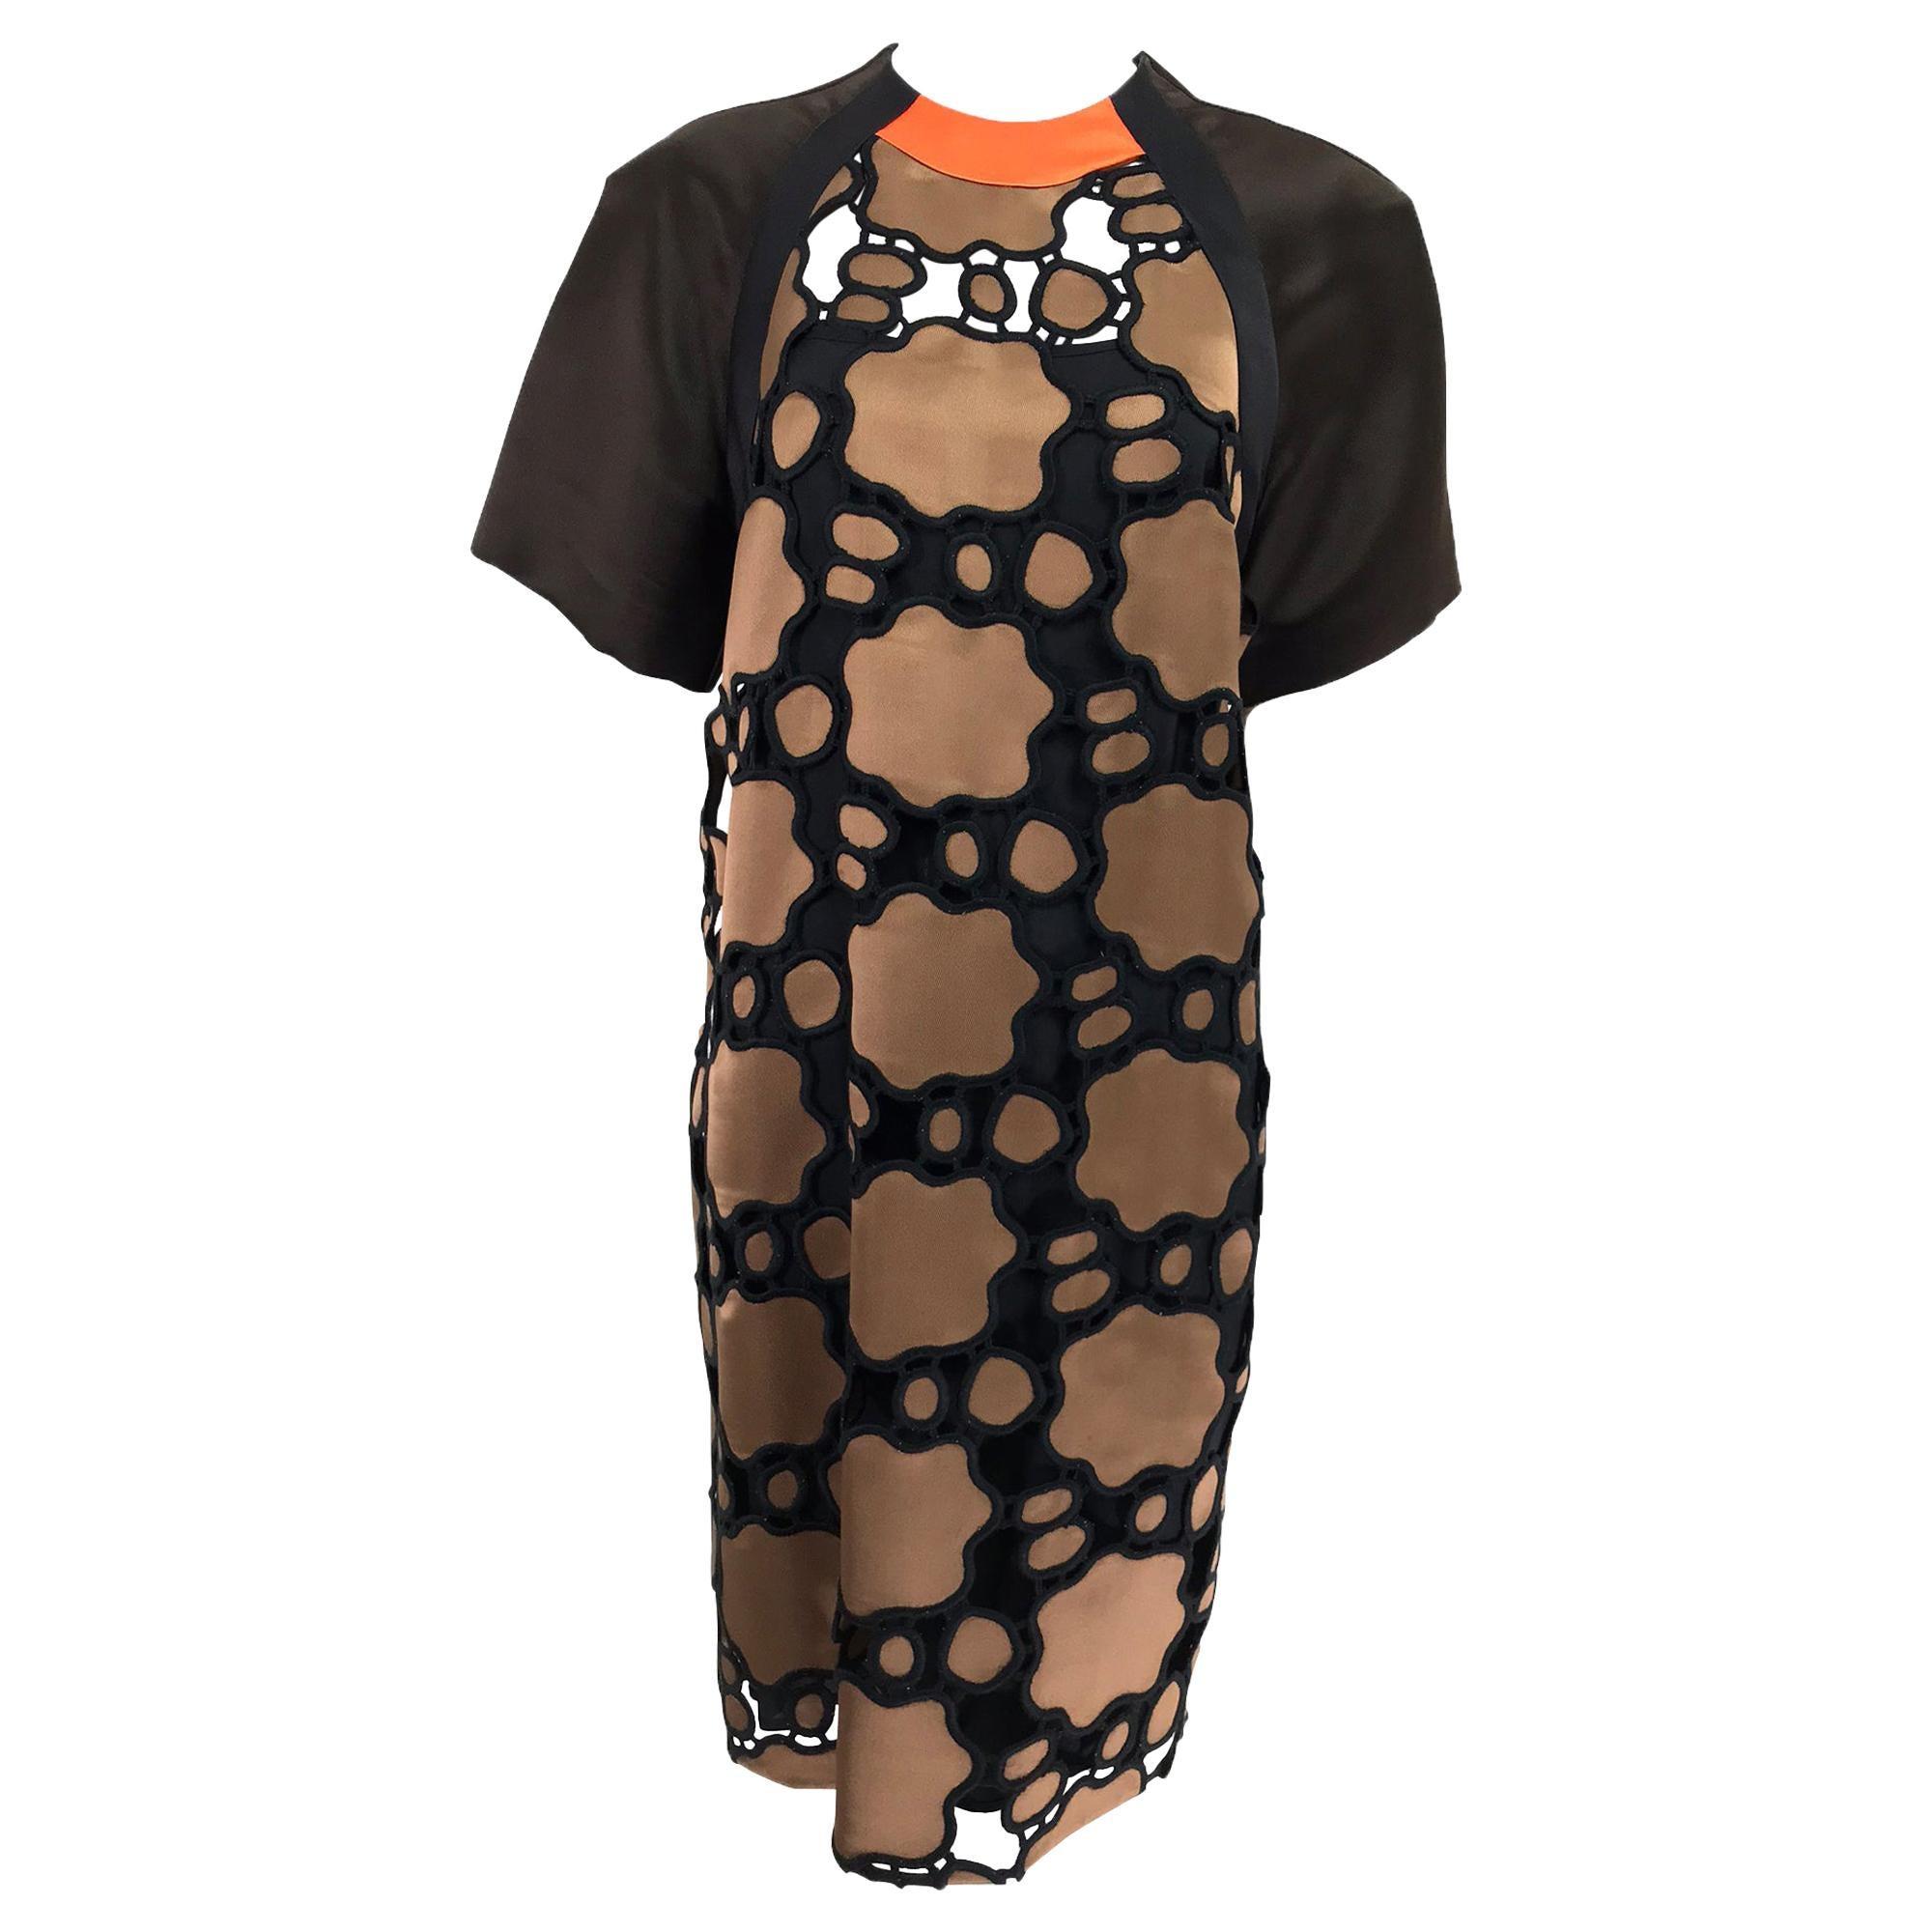 miu miu SIlk Cut Work Day Dress in Brown and Black with Orange